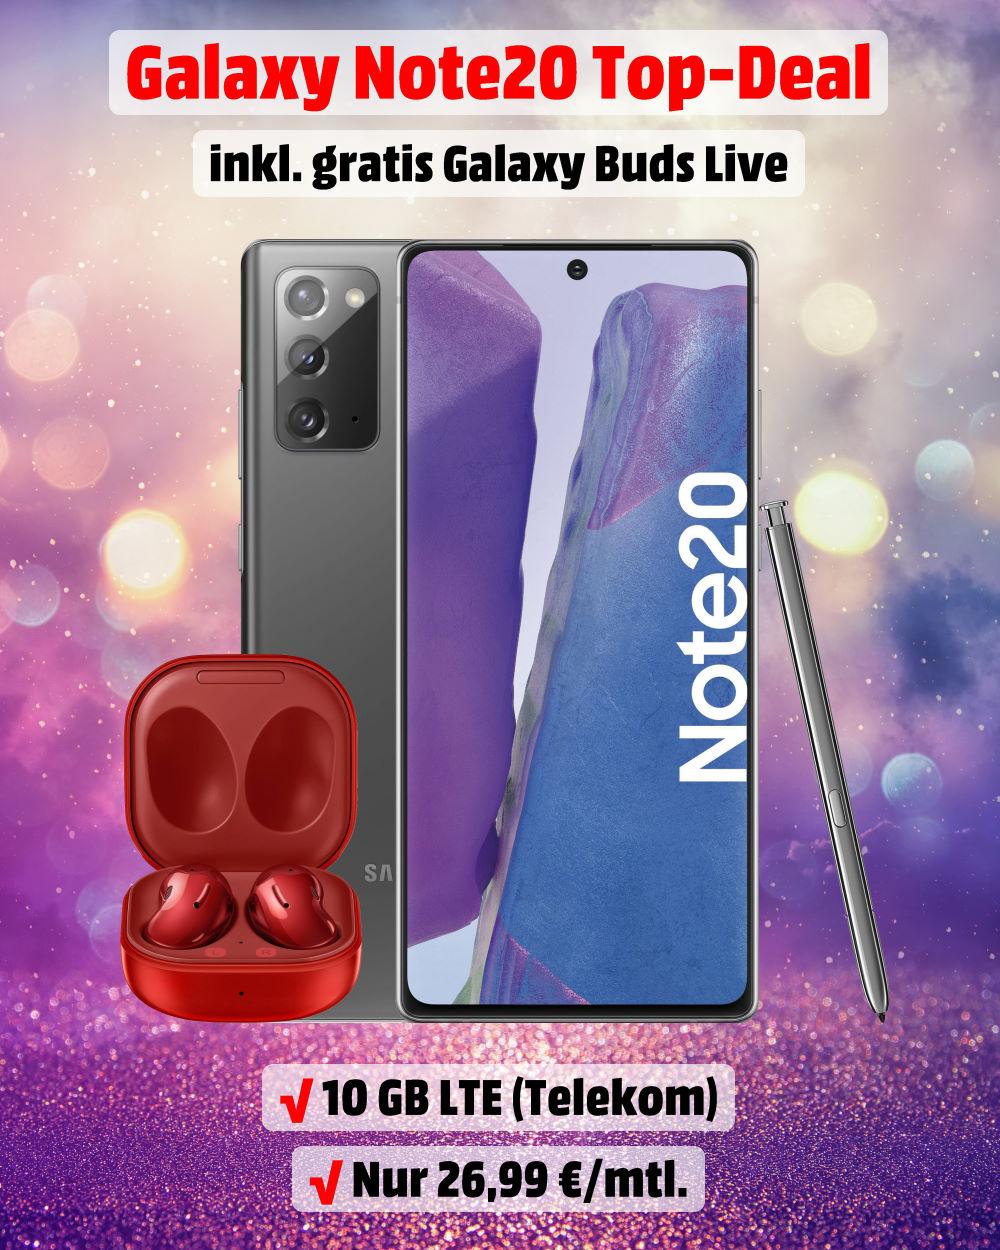 Galaxy Note20 inkl. Galaxy Buds Live und 10 GB LTE Allnet-Flat - Handy-Tarifvergleich